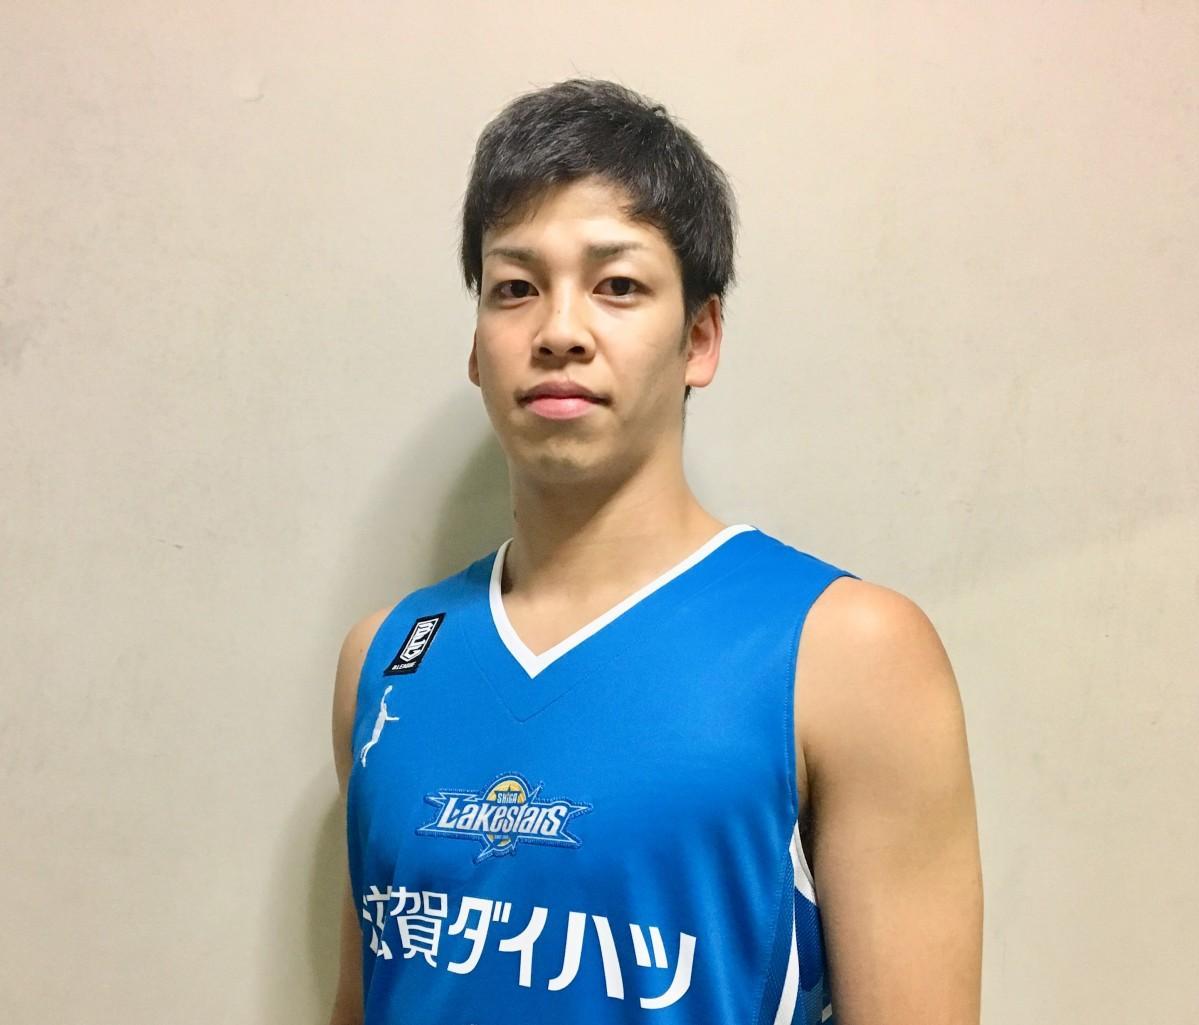 中村功平選手